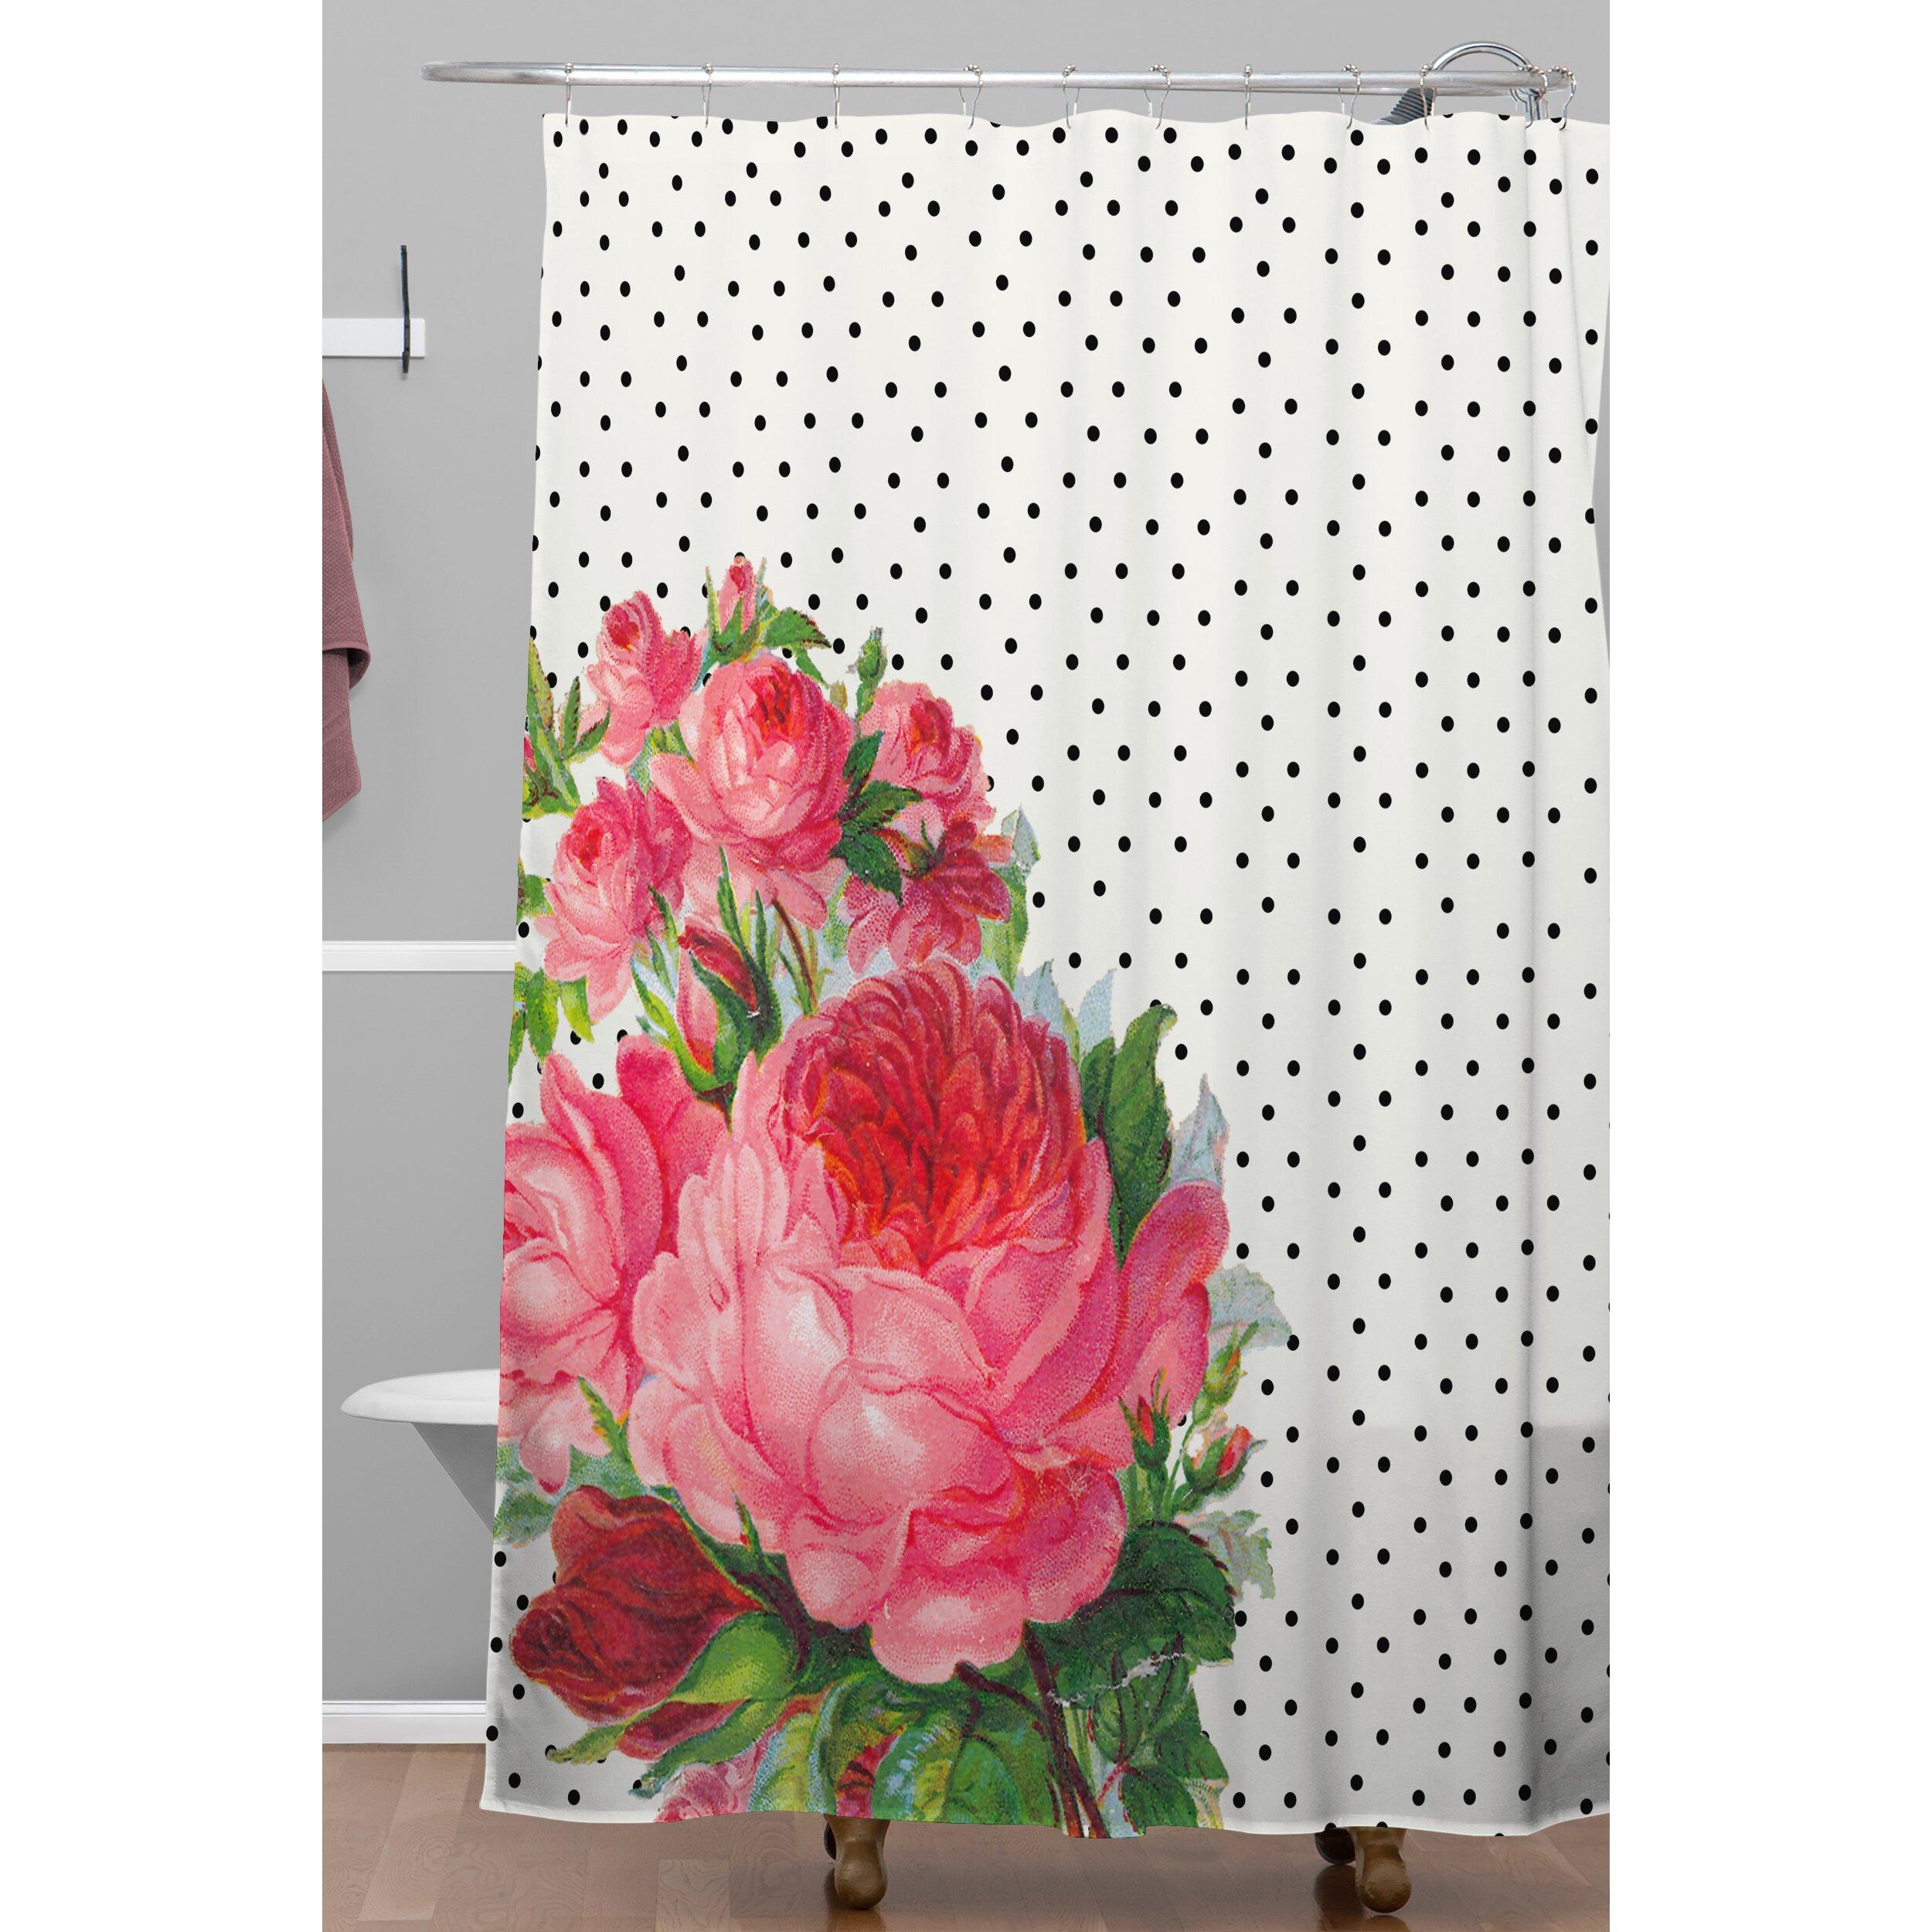 Hot pink shower curtain - Hot Pink Polka Dot Shower Curtain East Urban Home Allyson Johnson Floral Polka Dot Shower